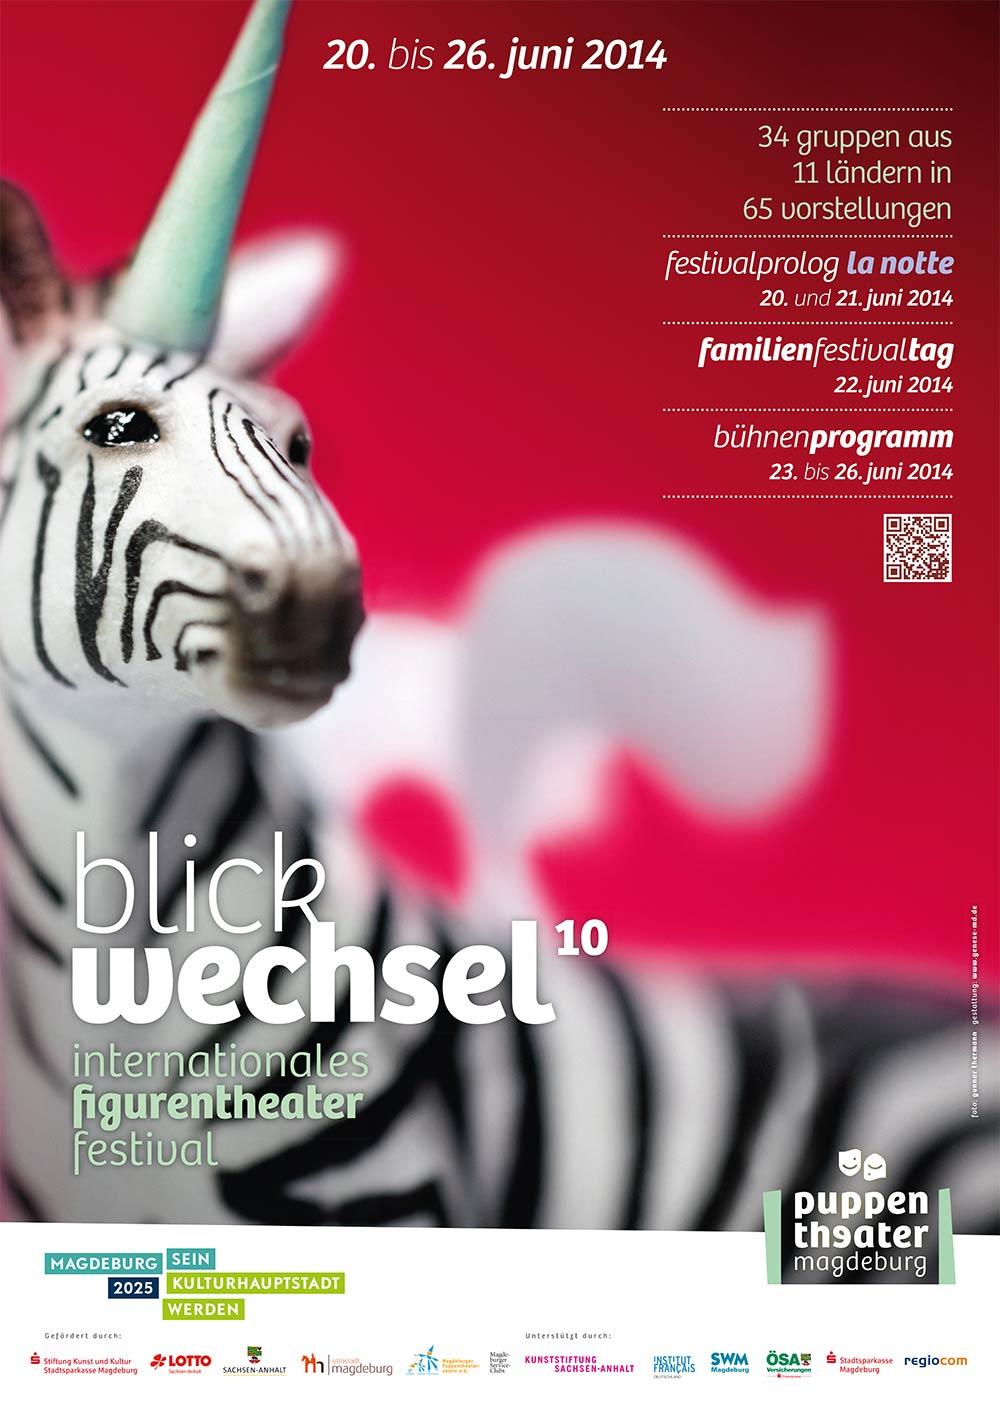 Blickwechselfestival 2014